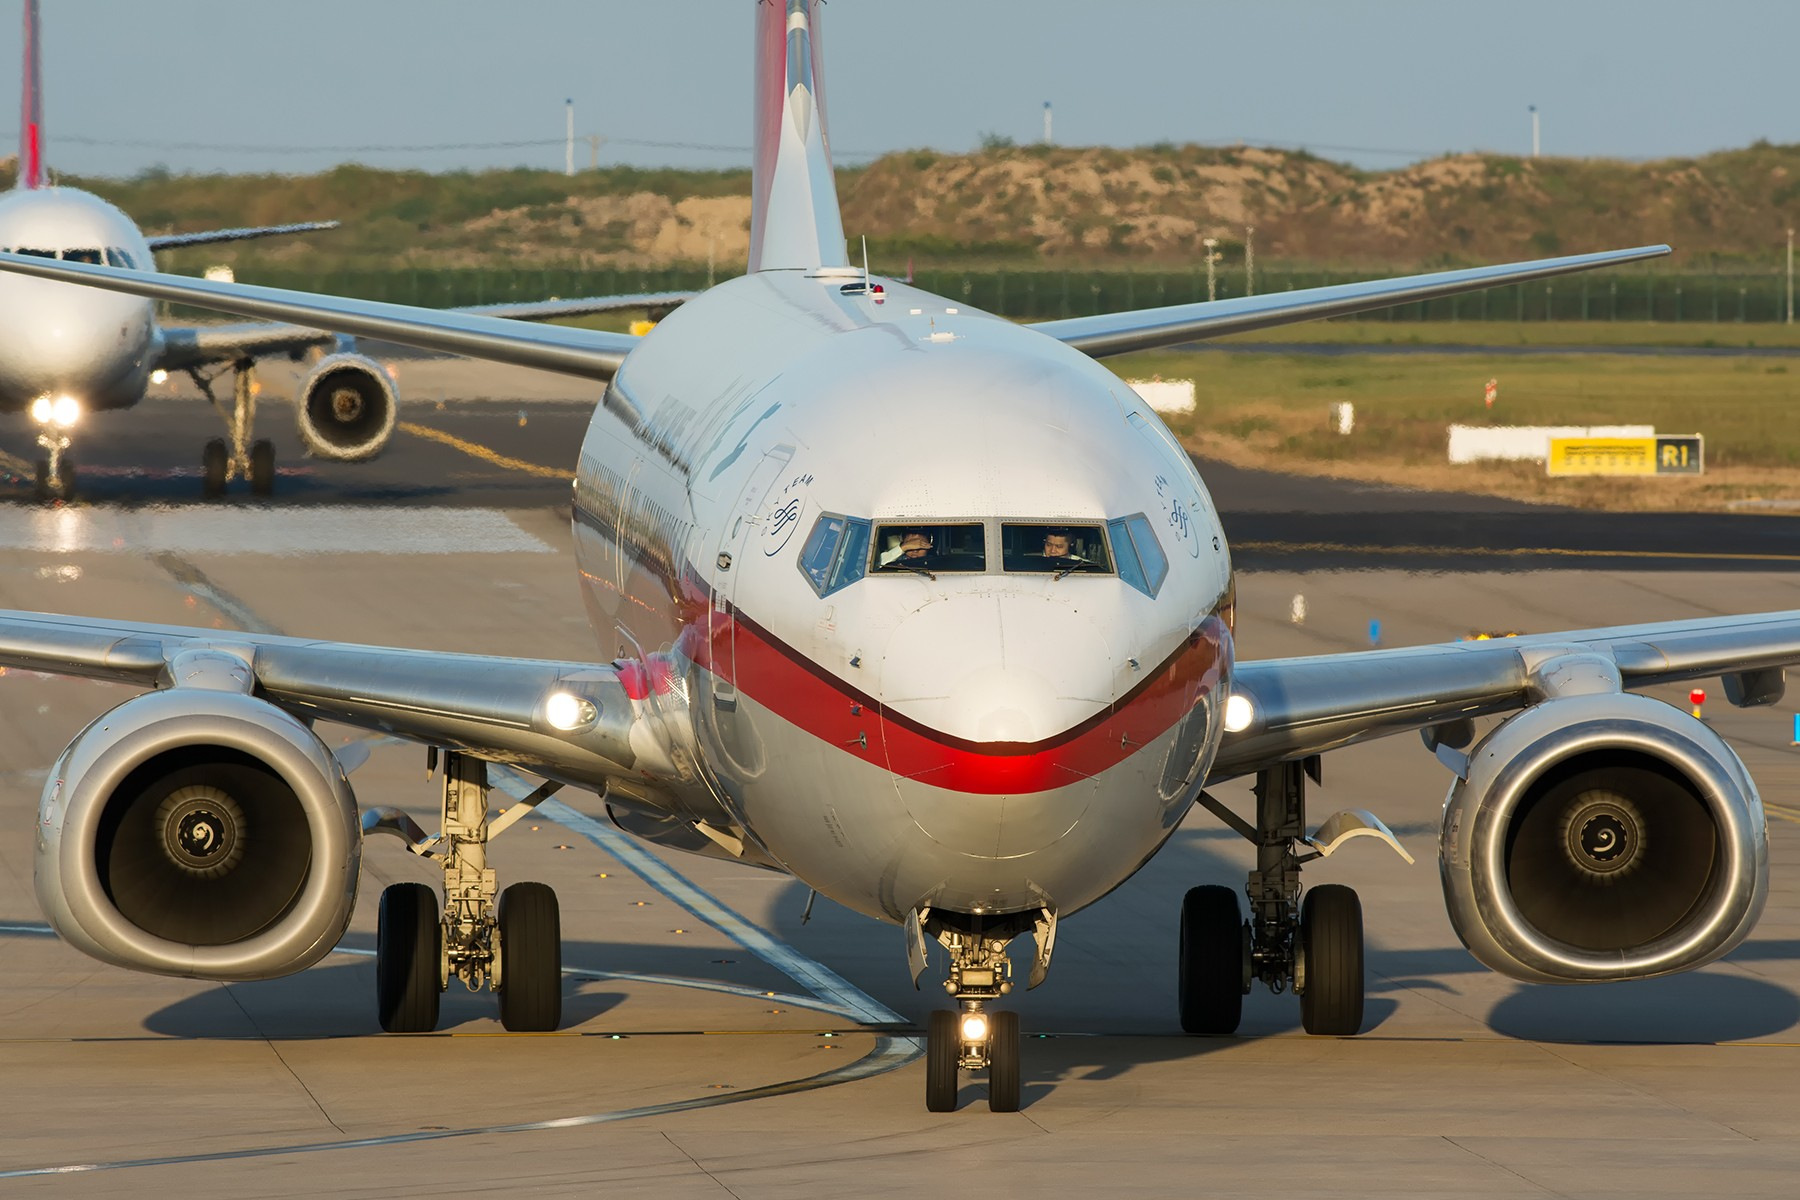 Re:[原创]【PVG】夕阳无限好,只是近黄昏 BOEING 737-800 B-1721 中国上海浦东国际机场